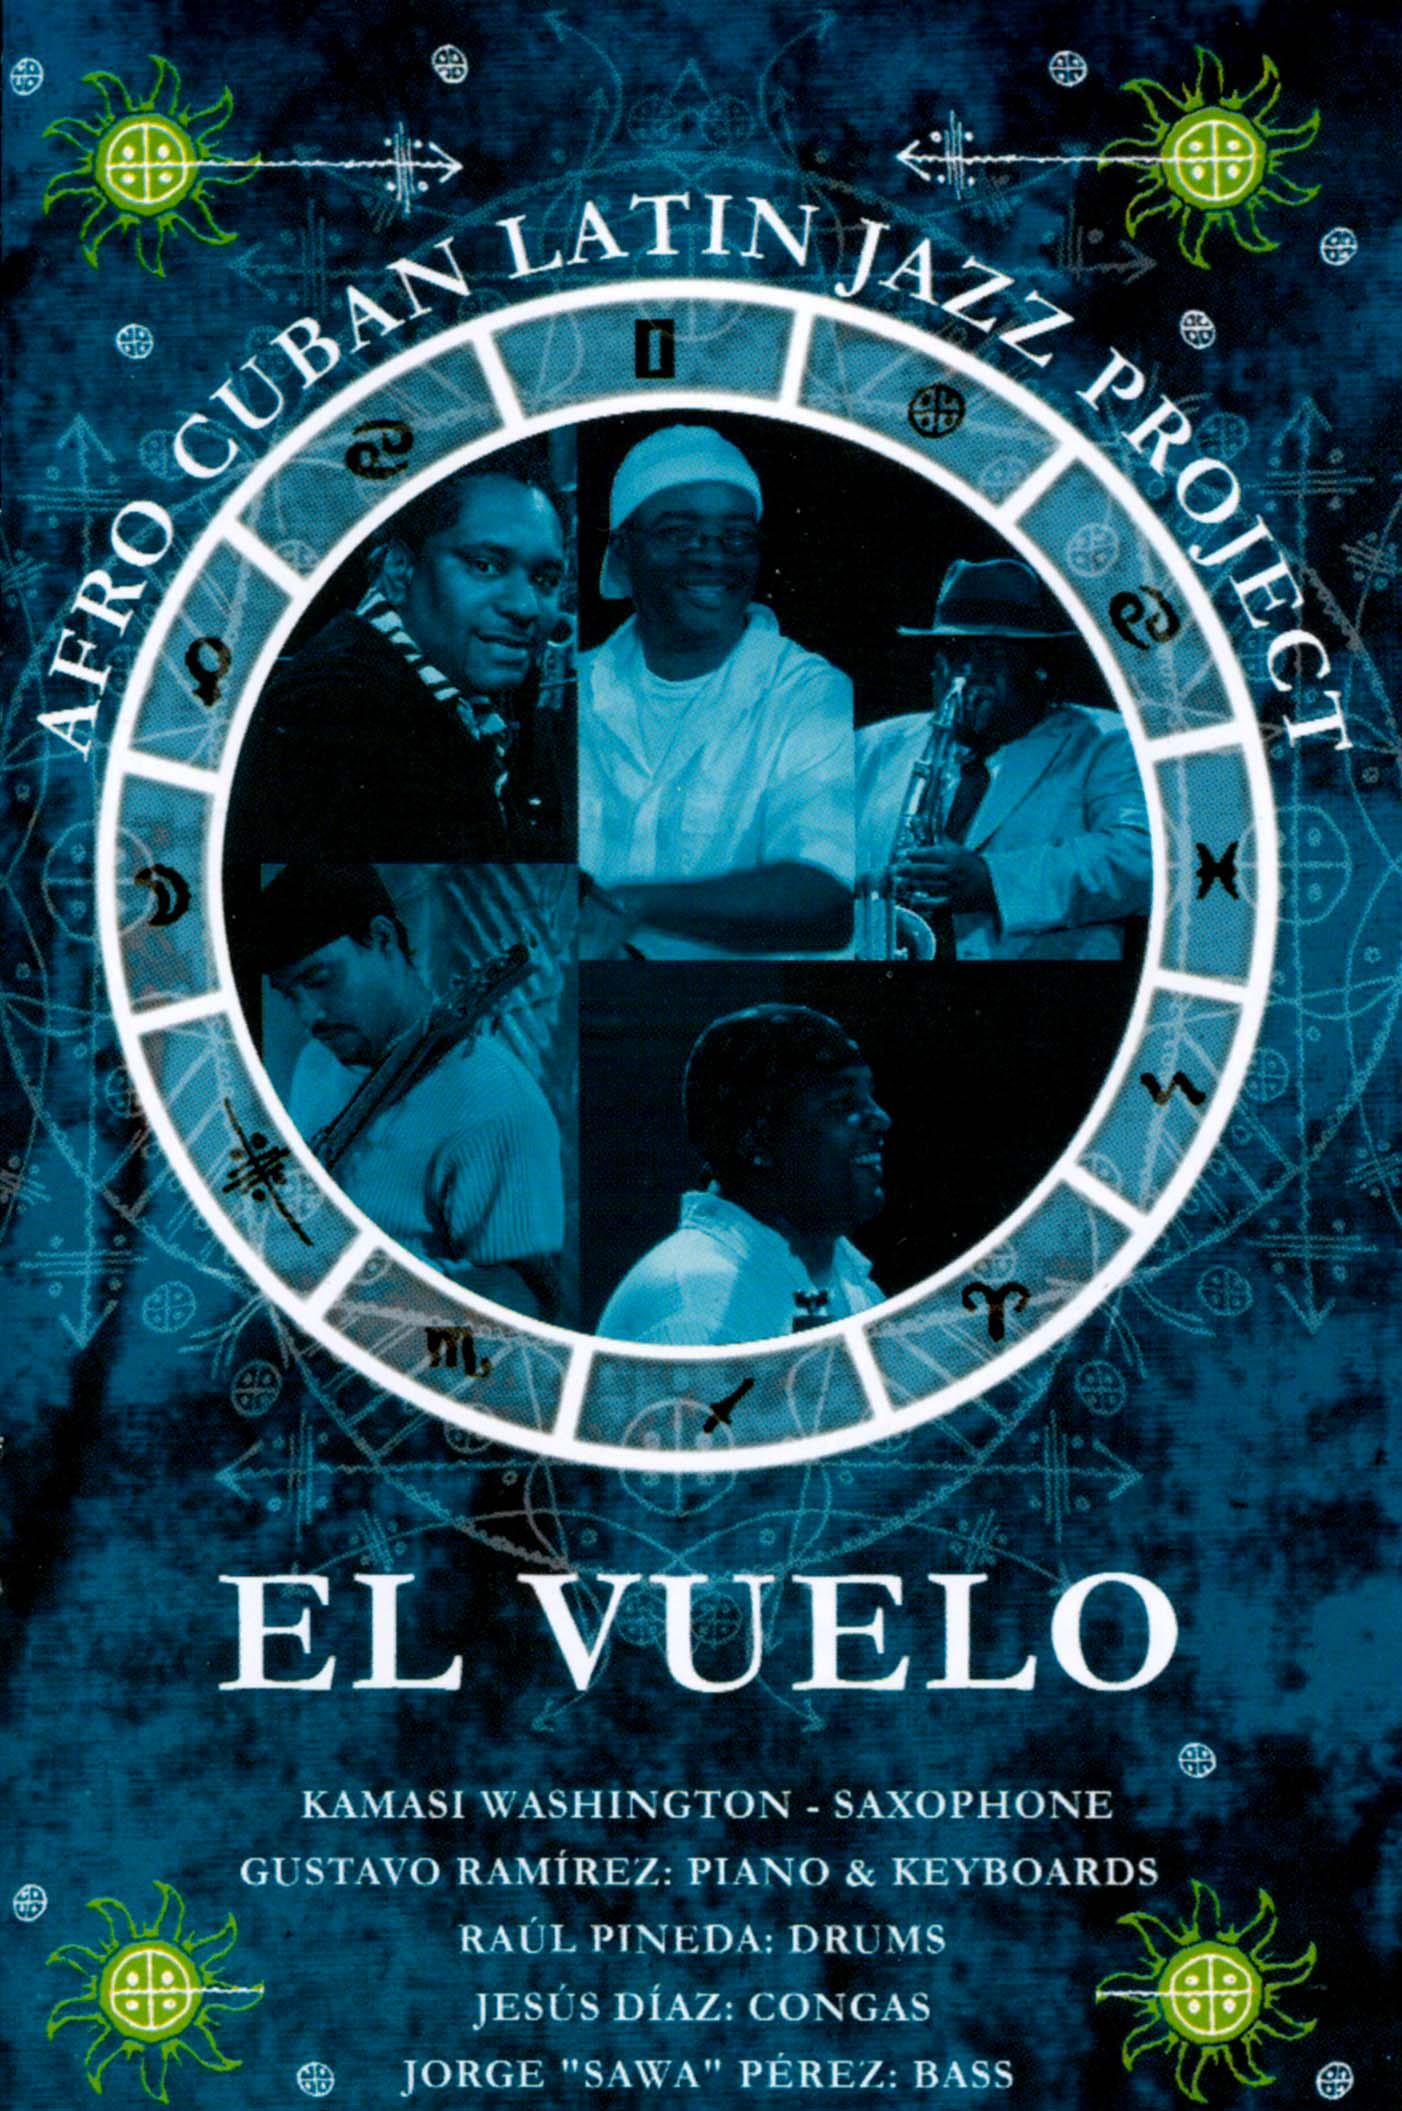 El Vuelo: Afro Cuban Latin Jazz Project